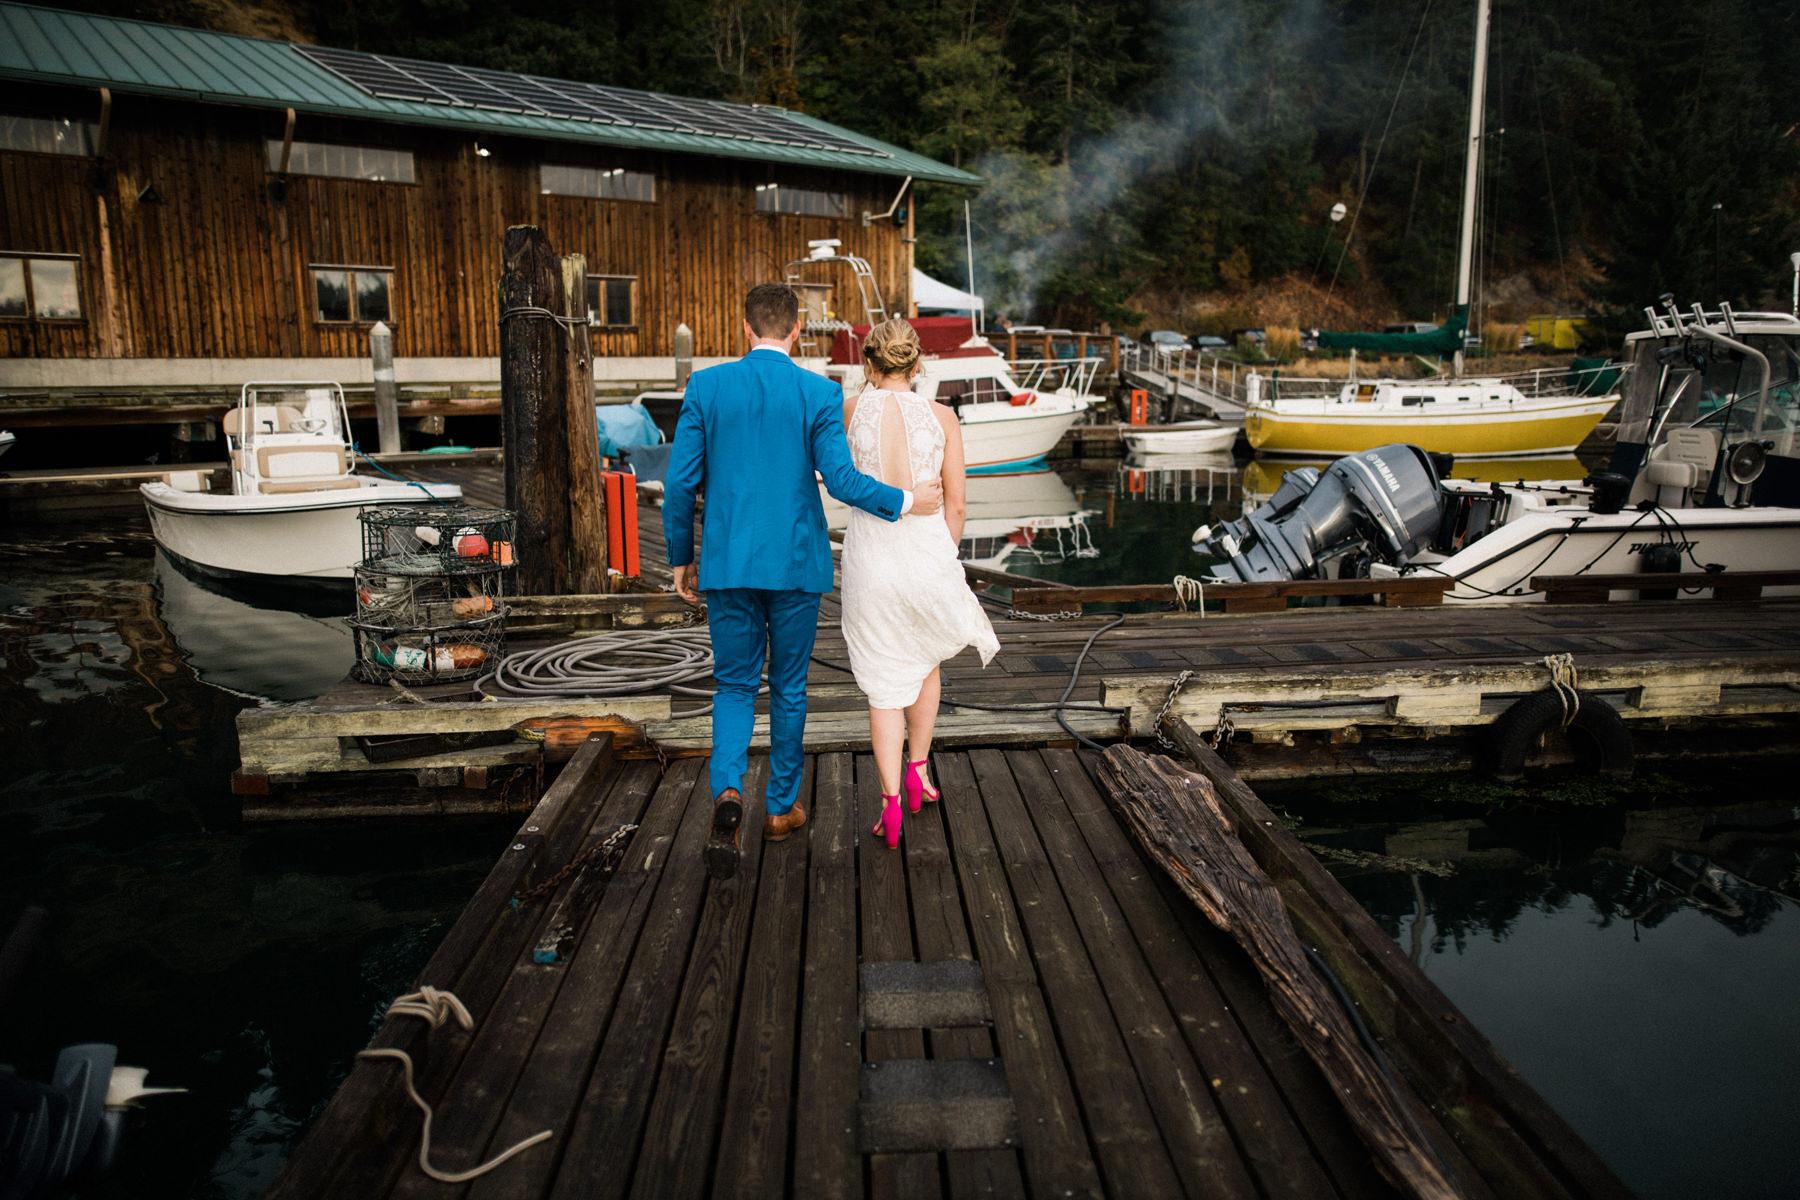 343-colorful-outdoor-lopez-island-wedding.jpg